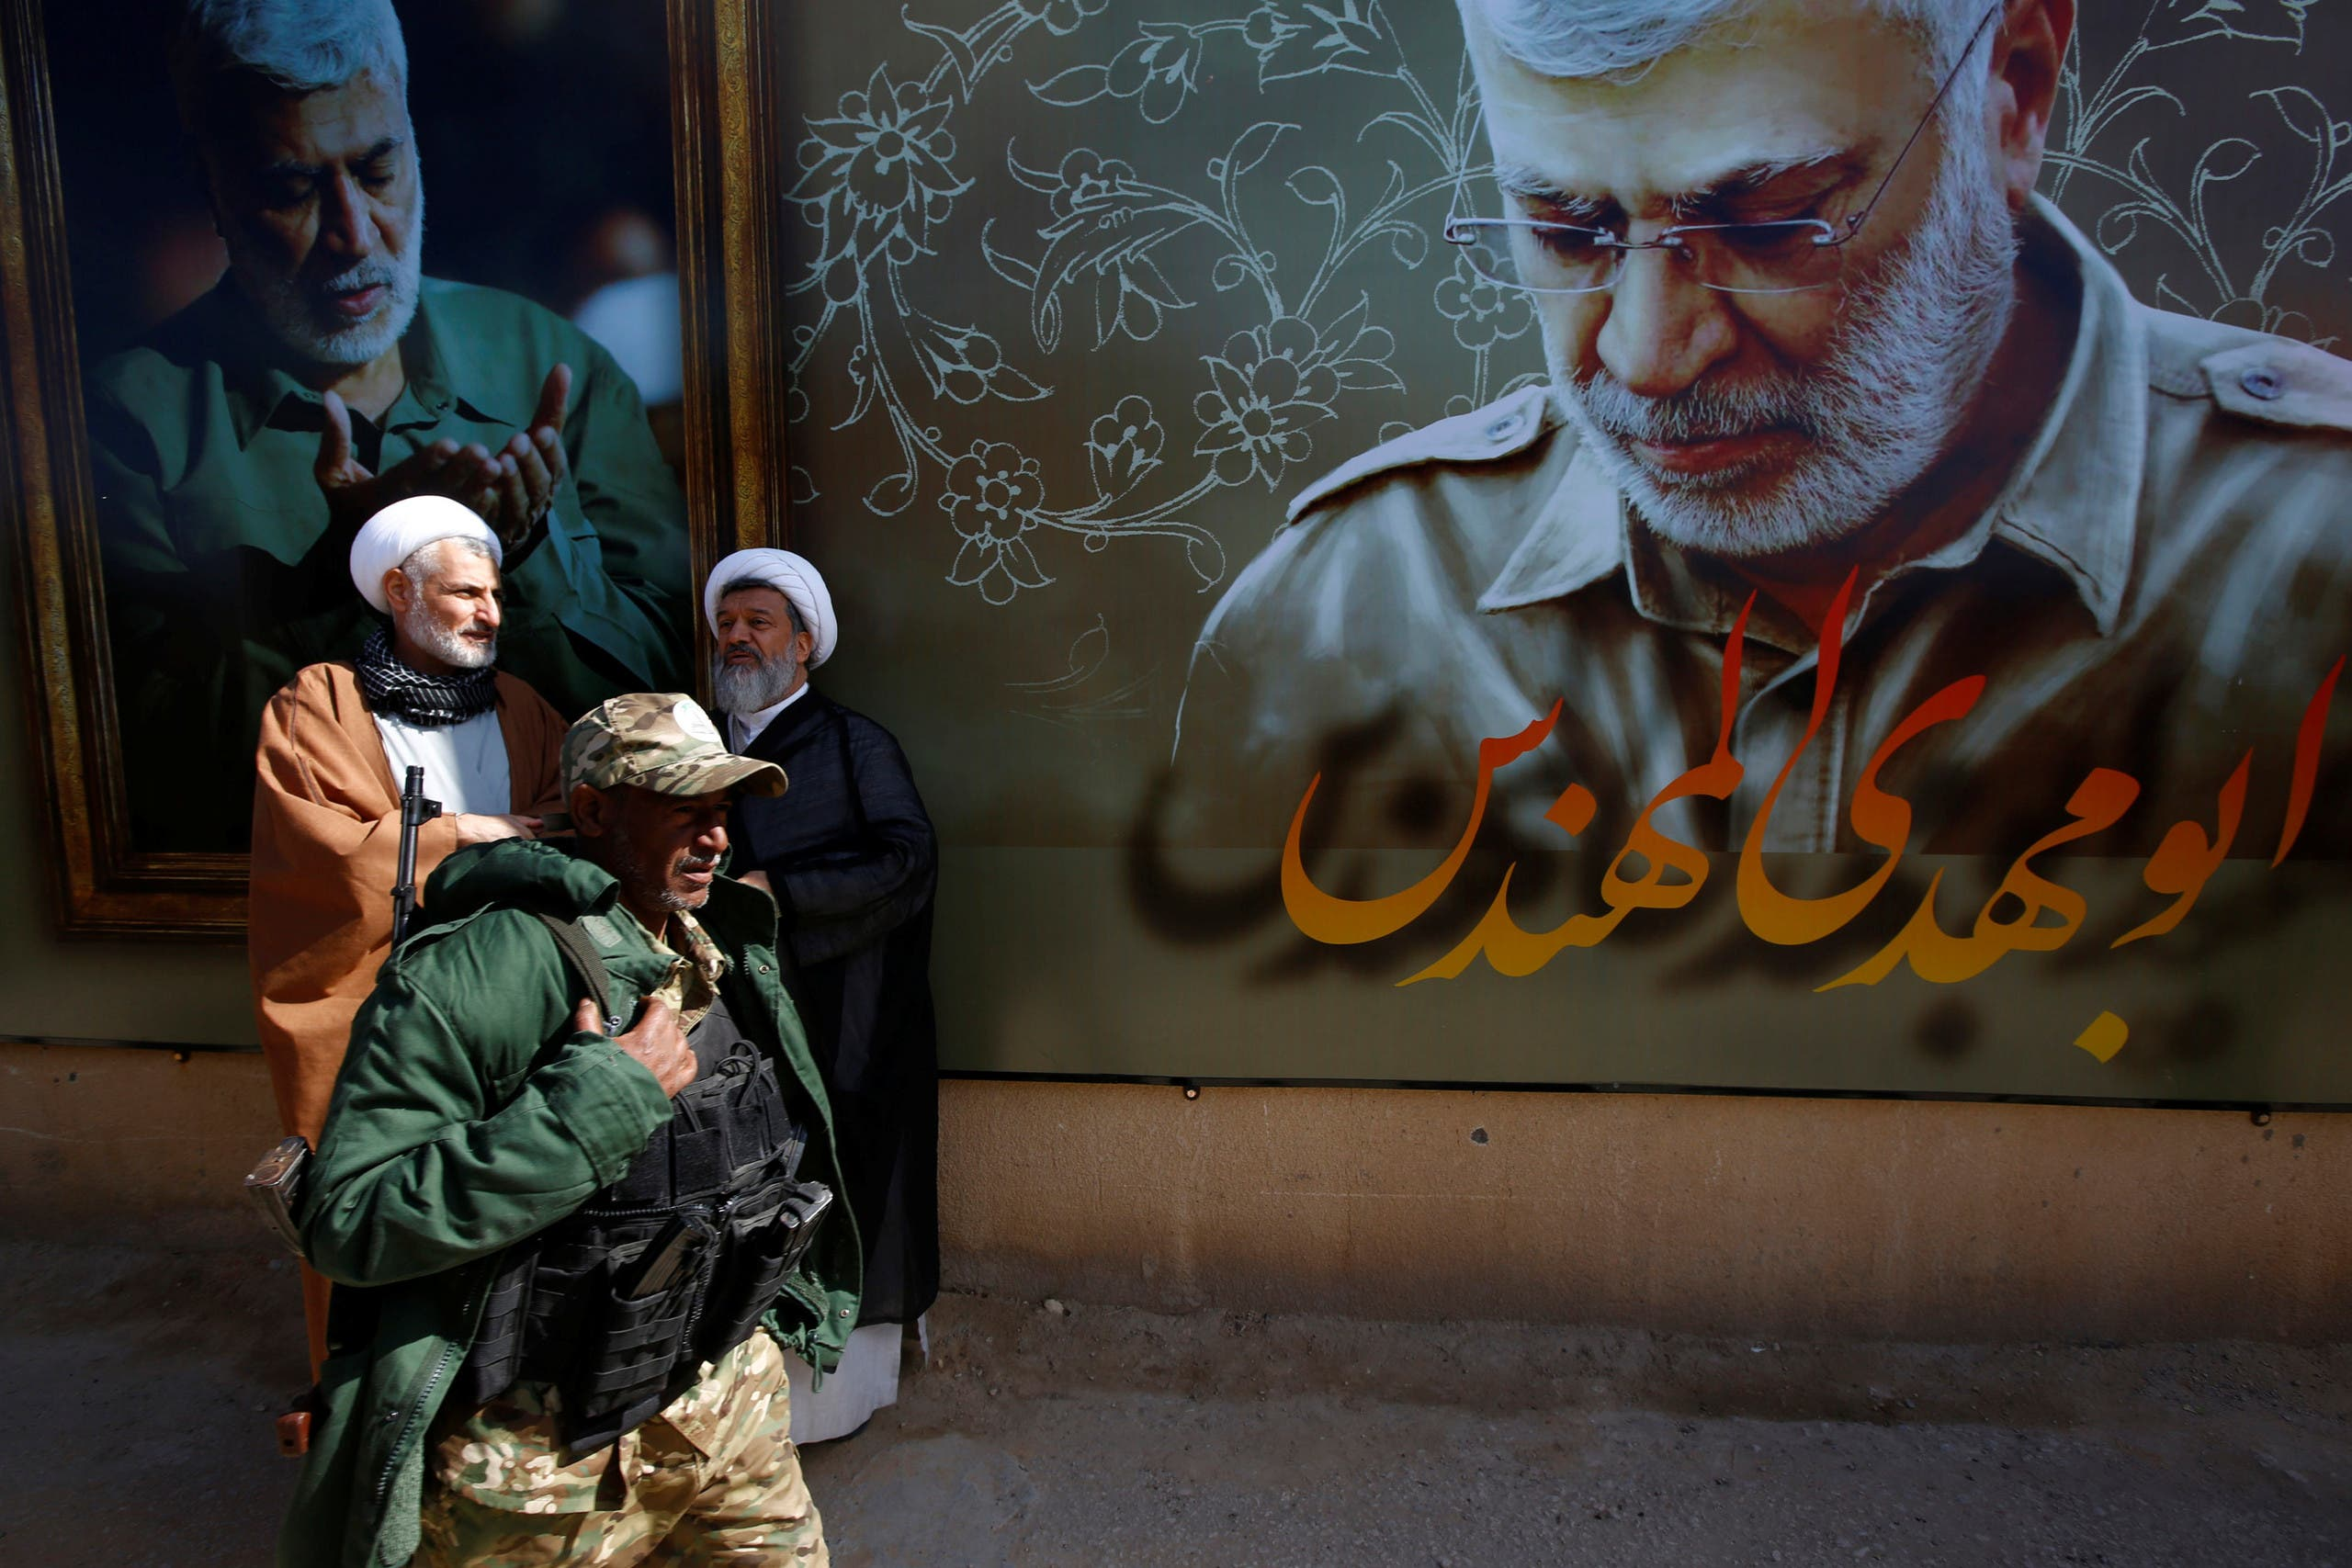 من موقع اغتيال سليماني وابو مهدي المهندس في بغداد(فرانس برس)